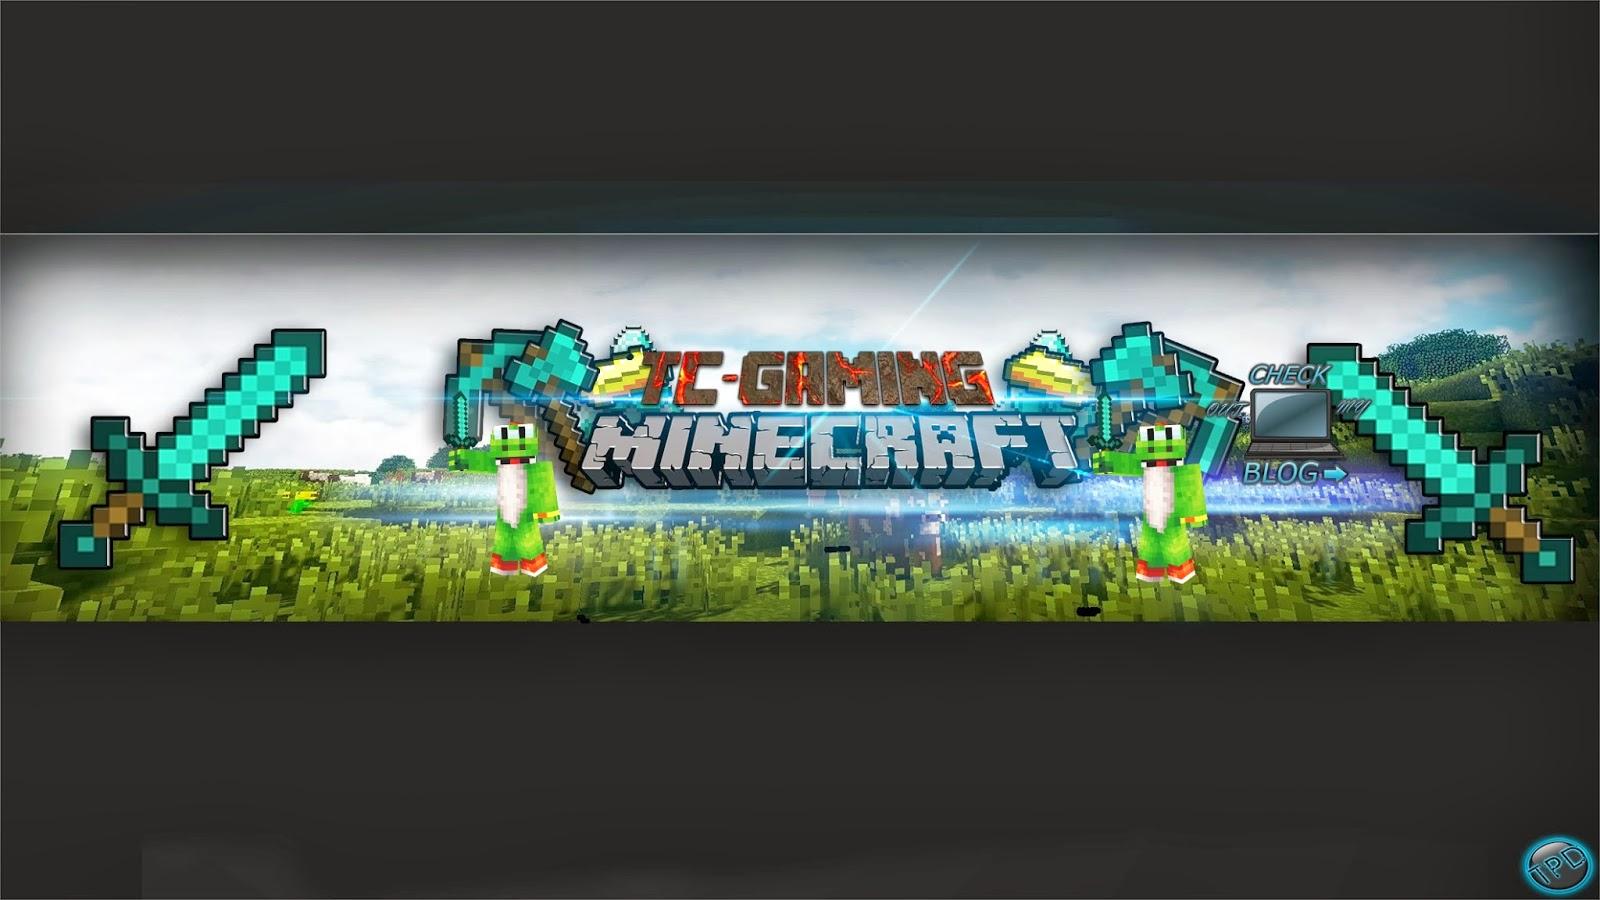 46 Minecraft Youtube Wallpaper Creator On Wallpapersafari